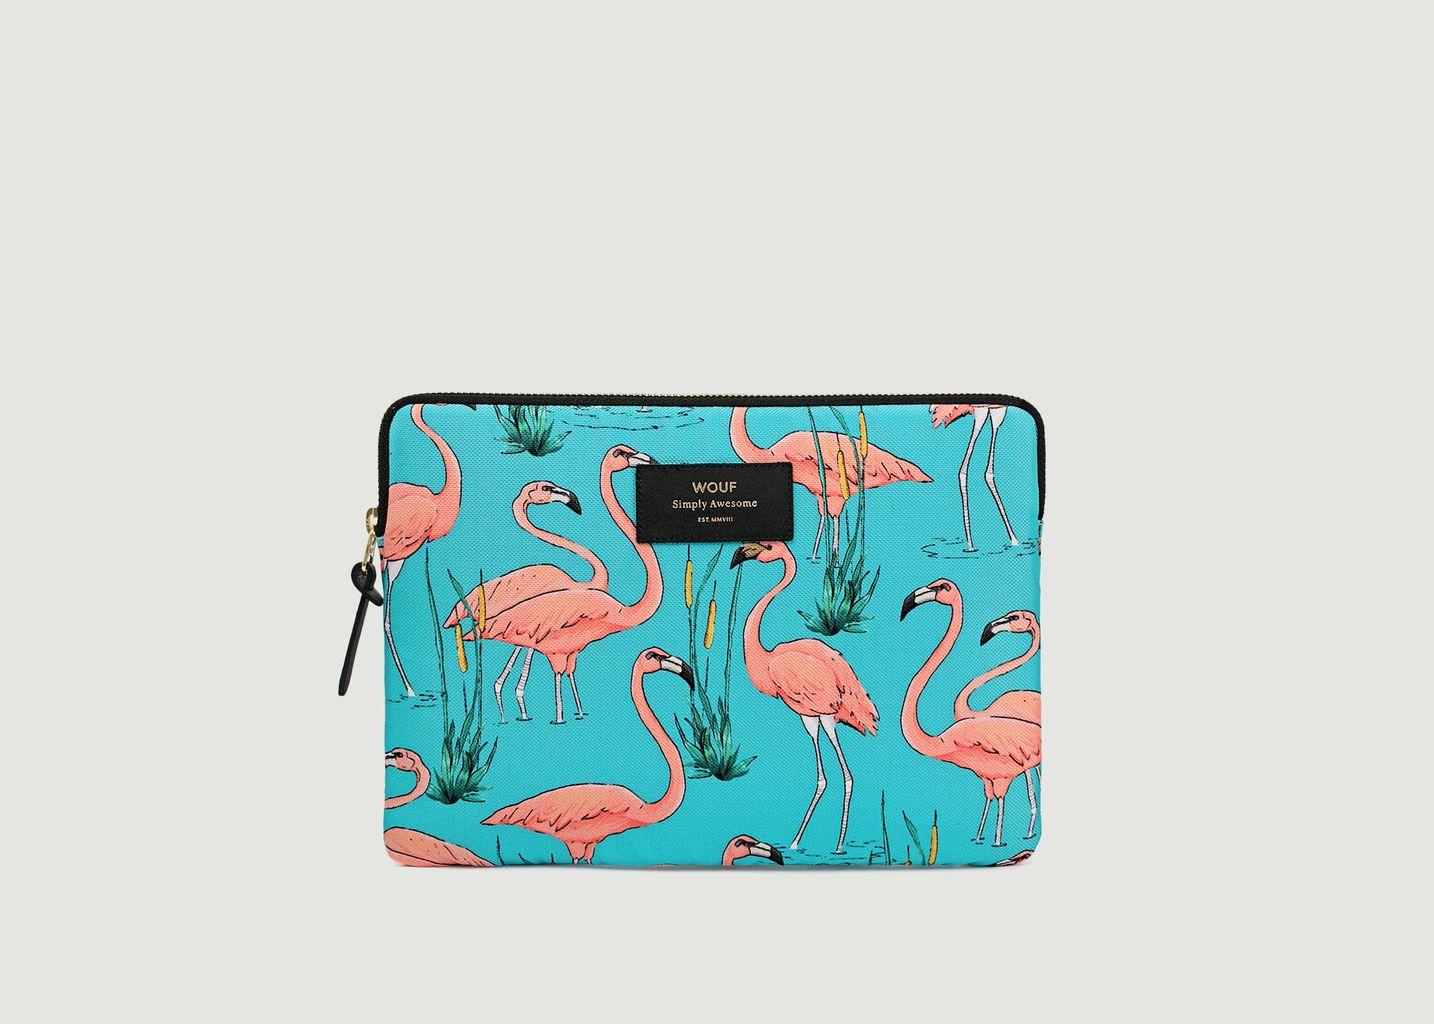 Pochette Ipad Pink Flamingos - Wouf